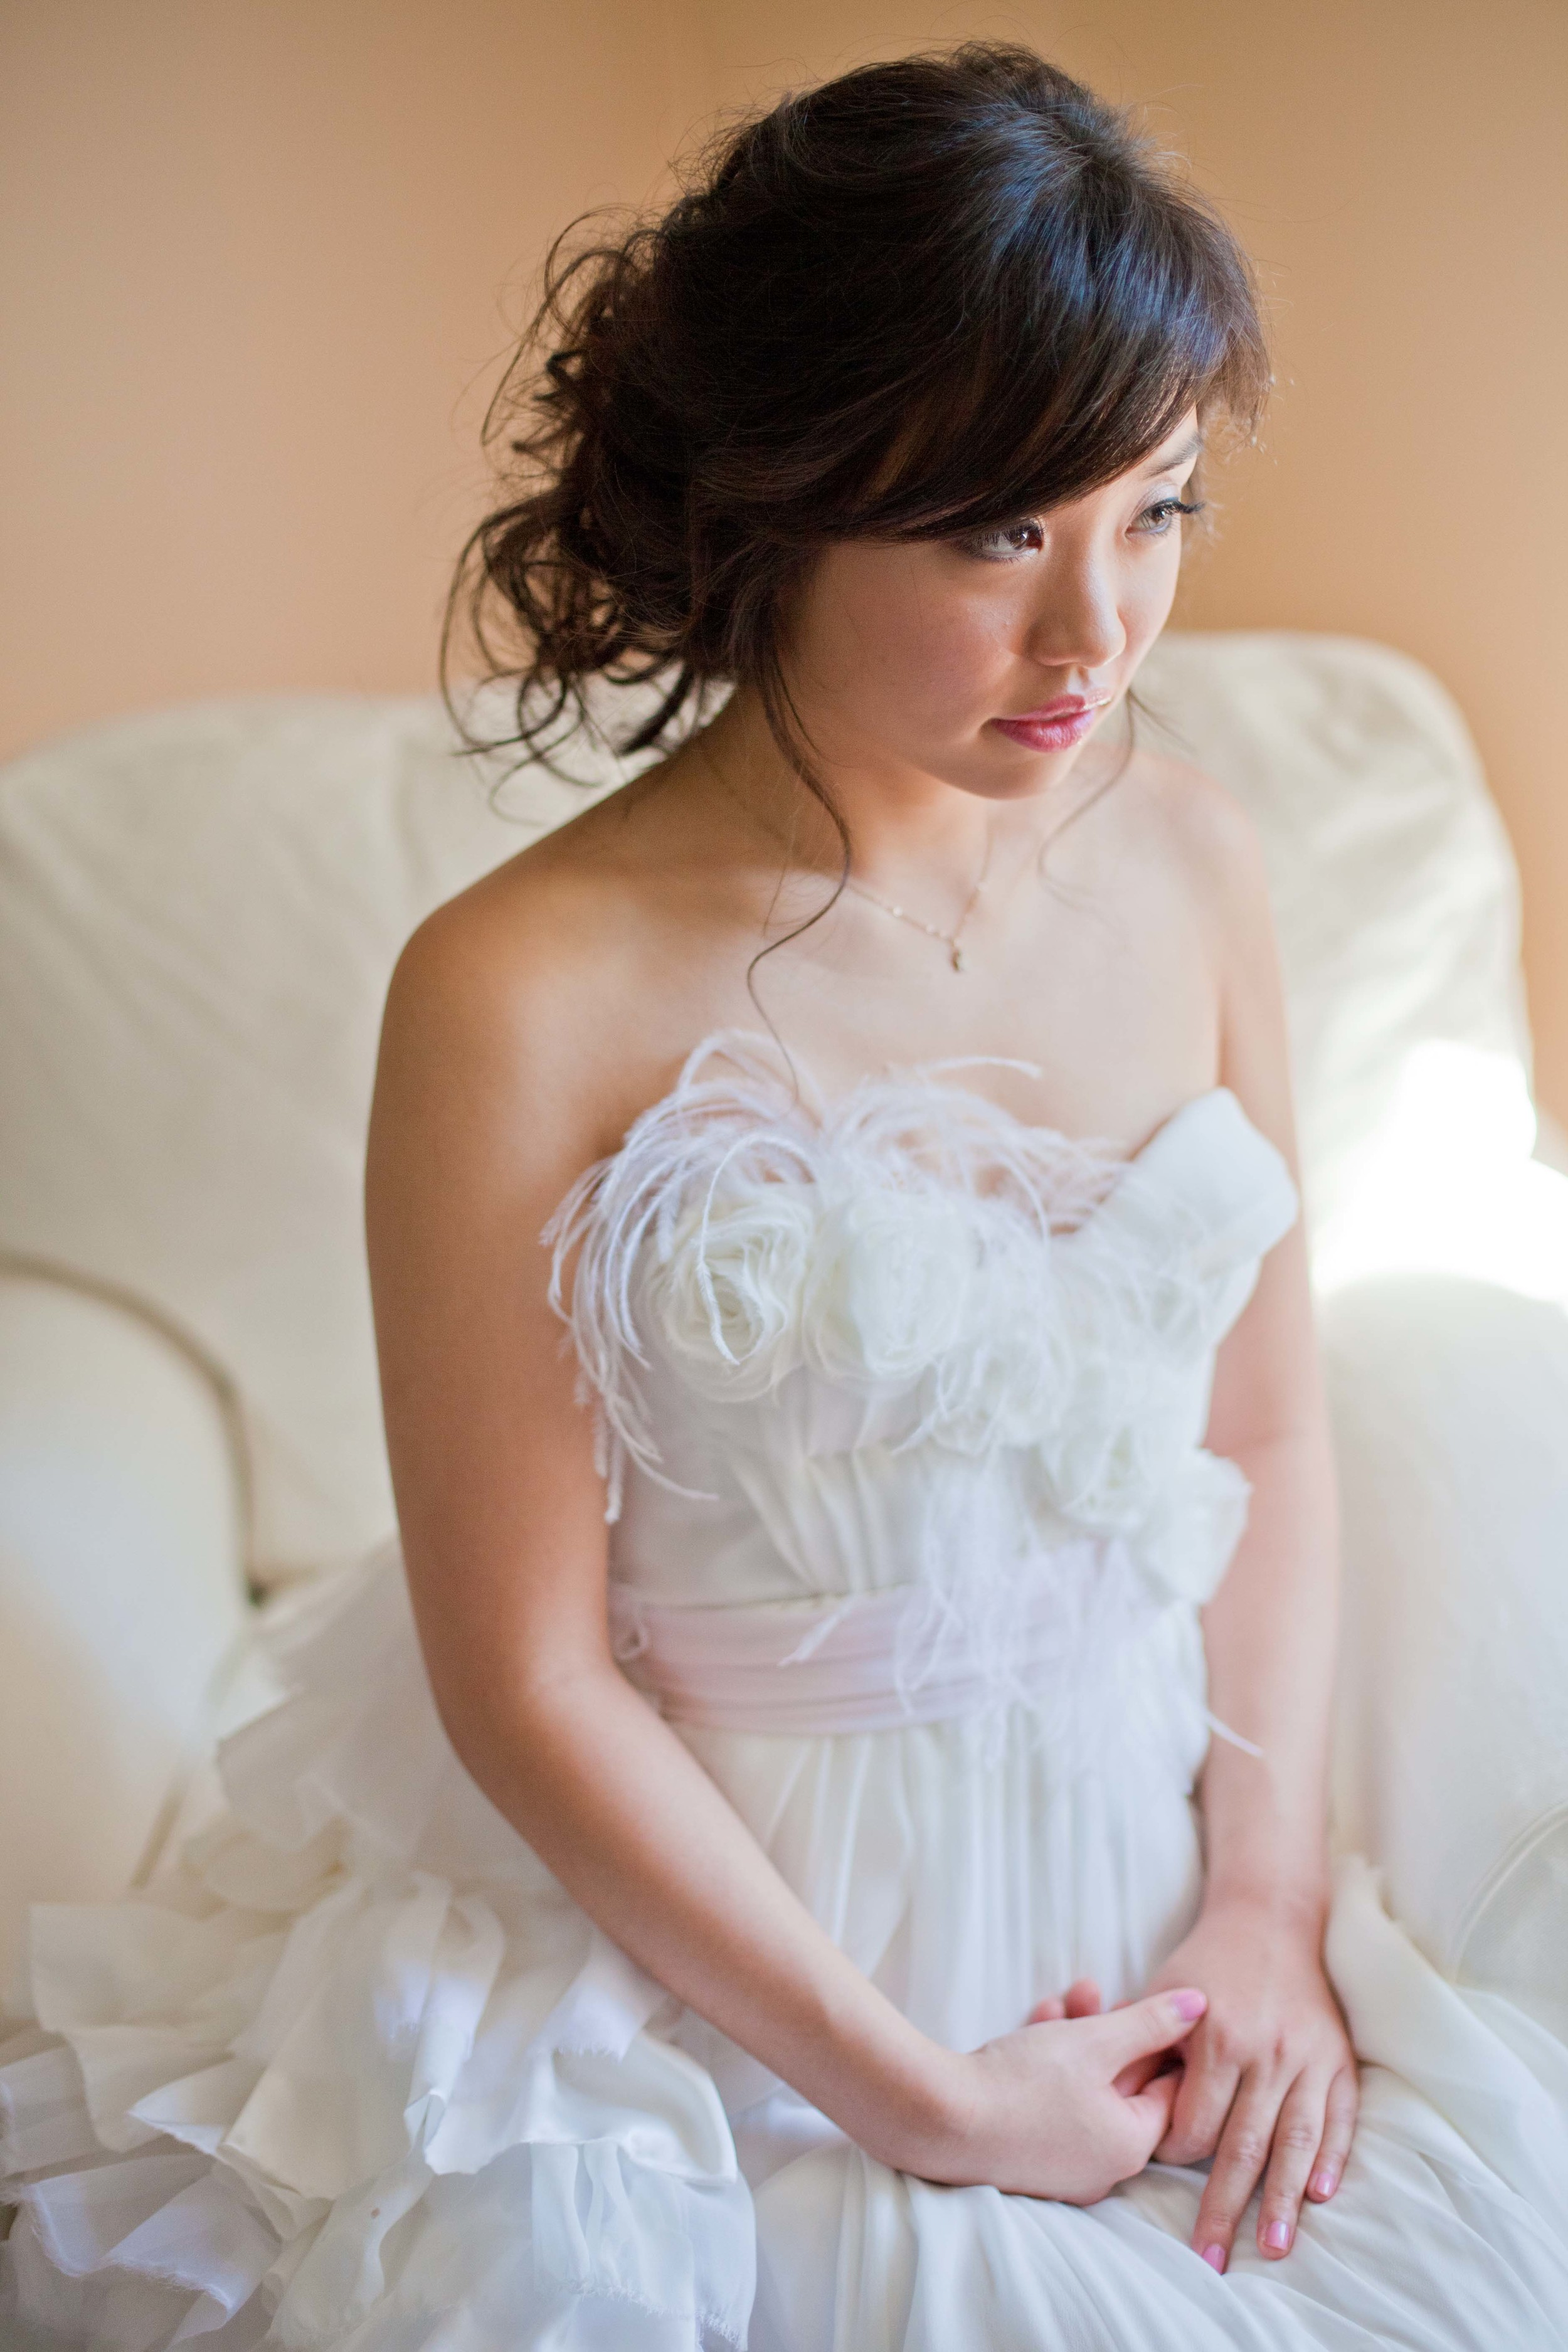 website_wedding (4 of 4).jpg